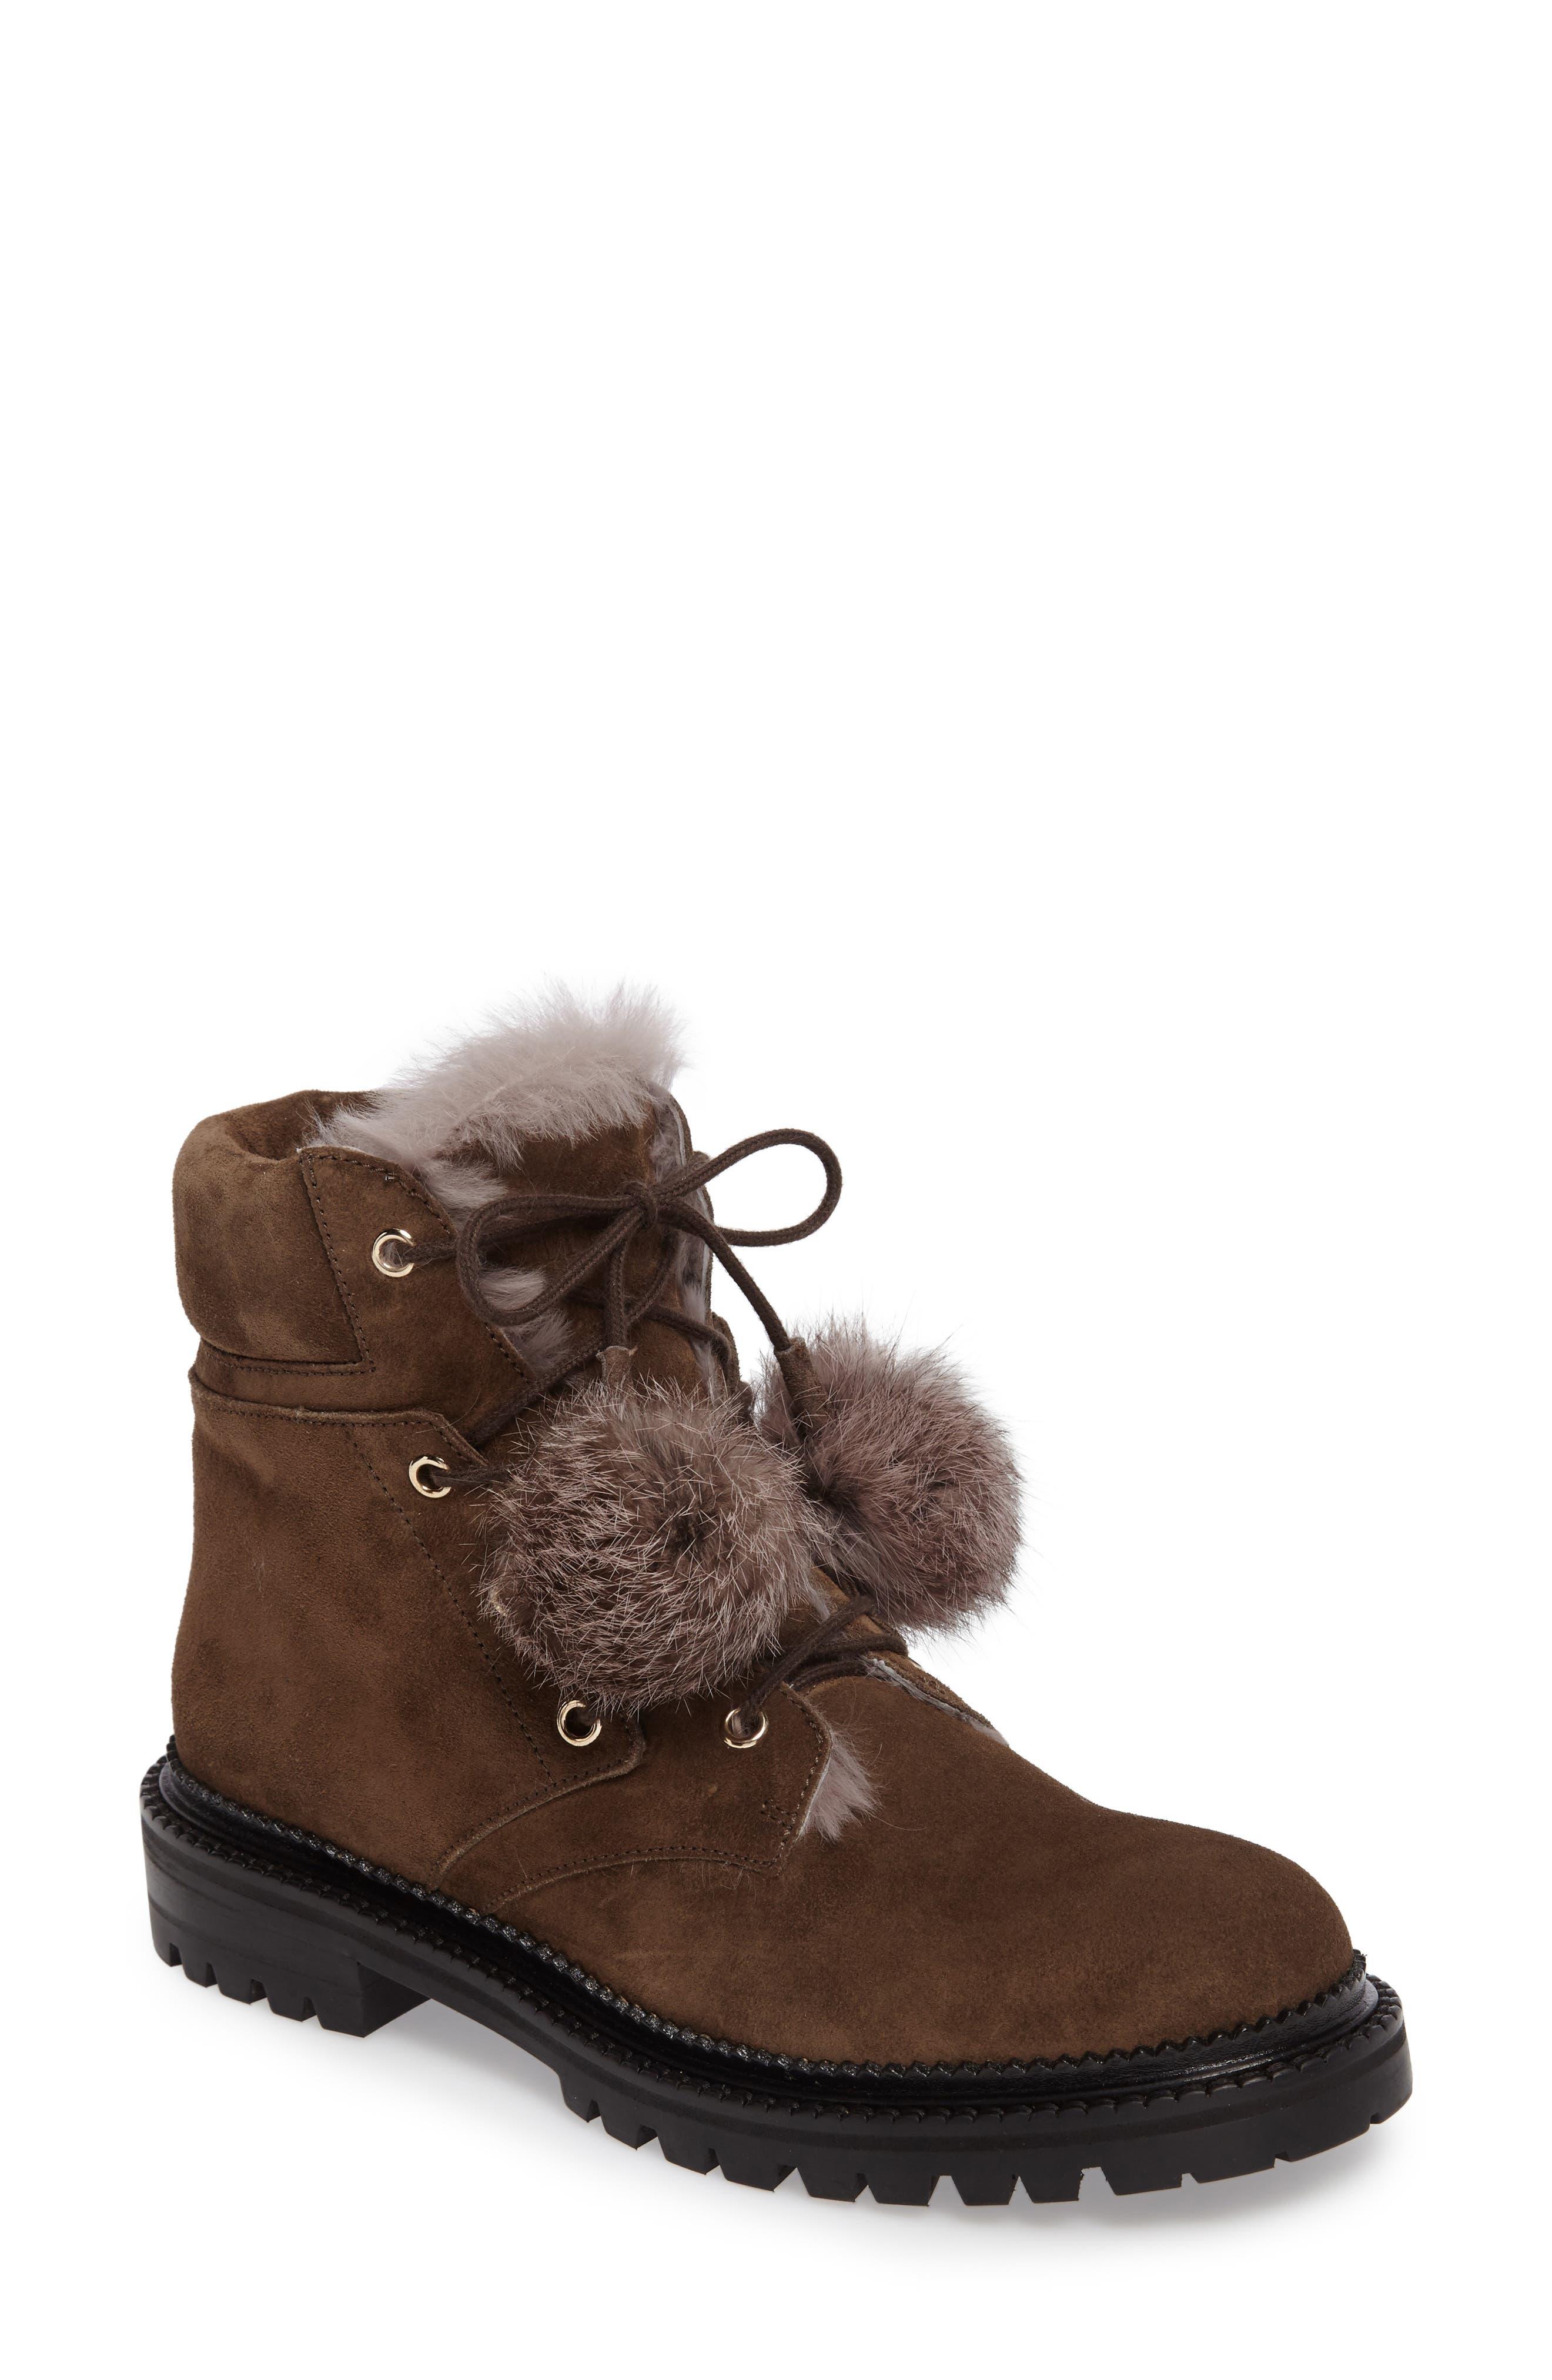 Alternate Image 1 Selected - Jimmy Choo Elba Genuine Rabbit Fur Boot (Women)